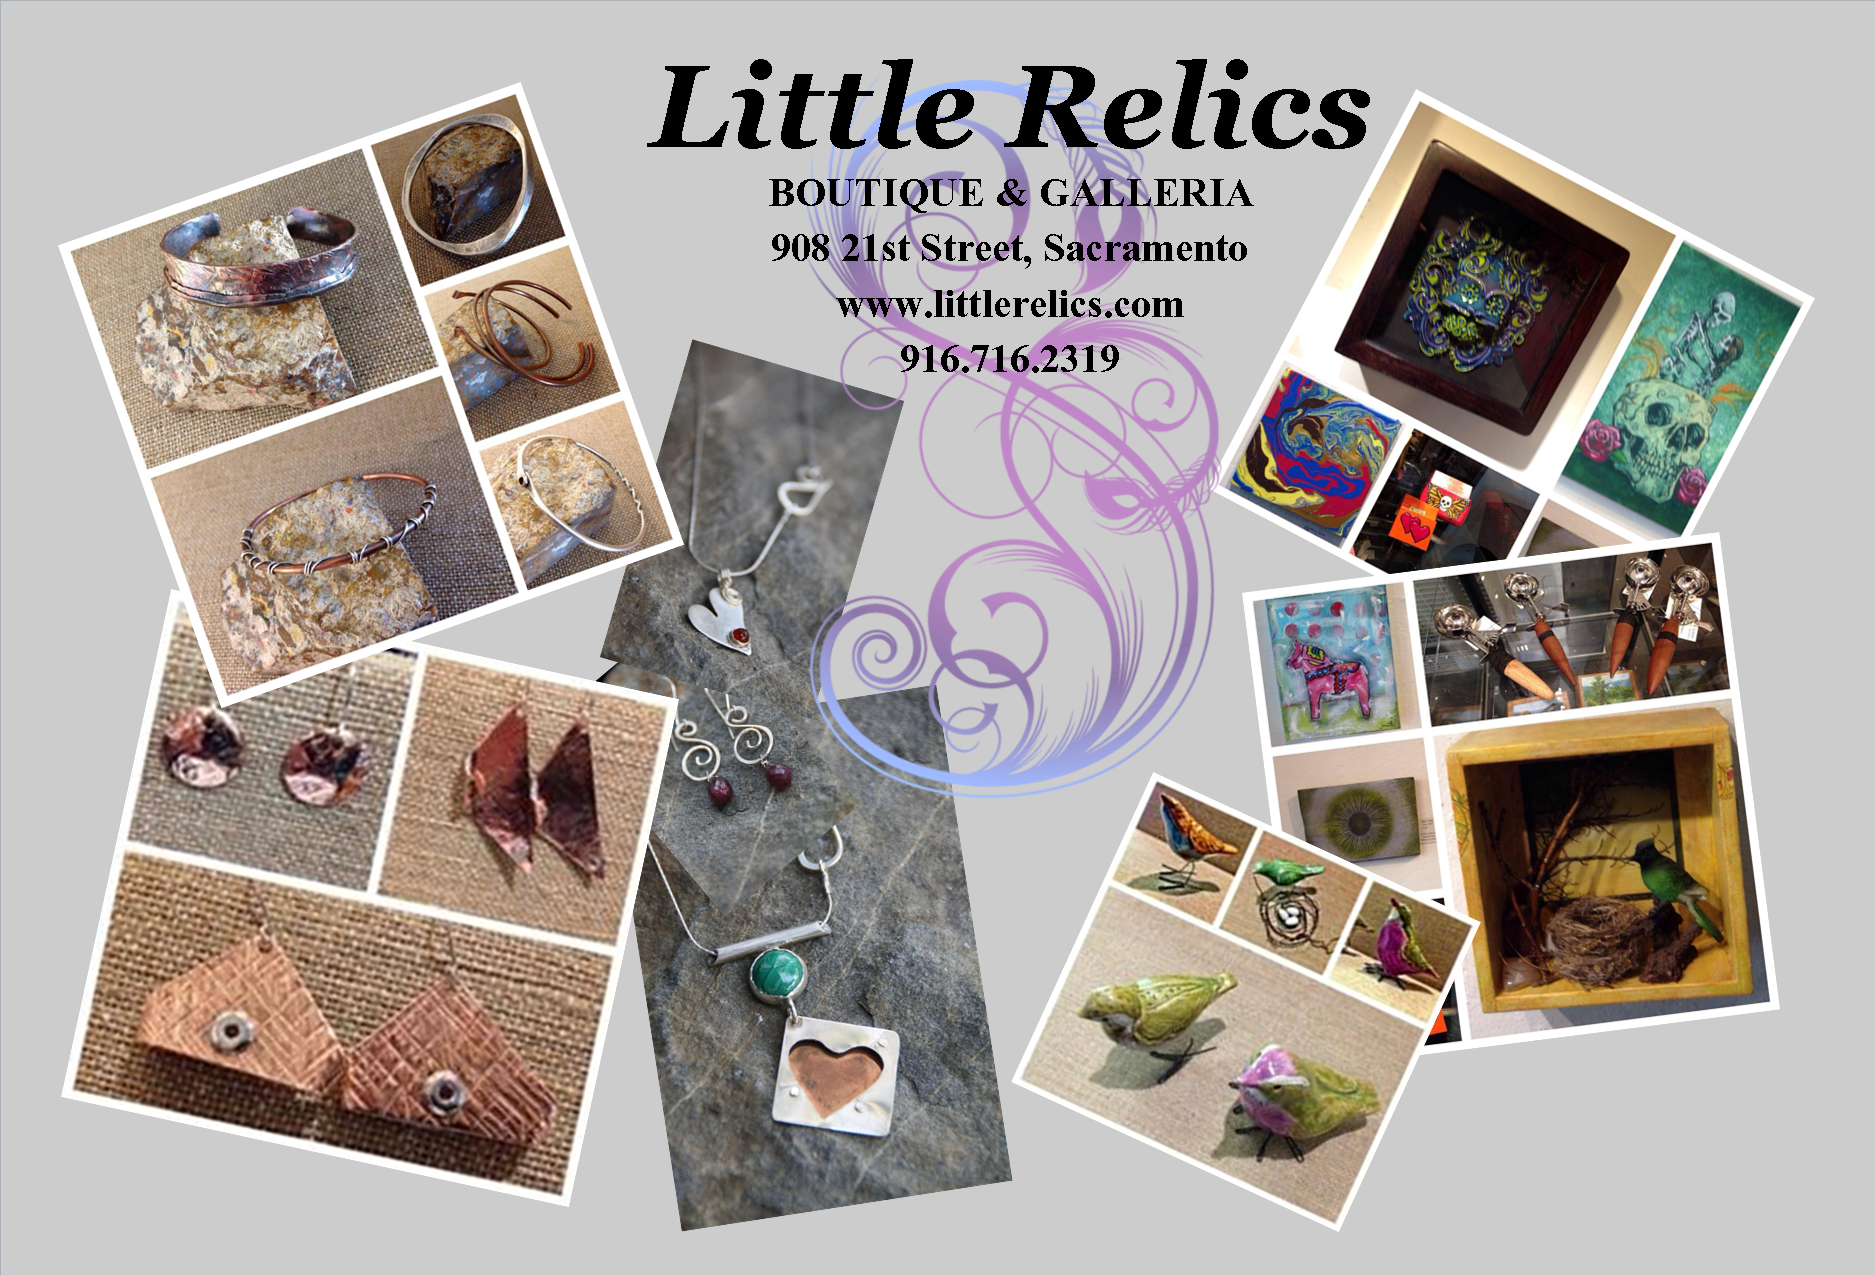 generic 2014 little relics flyer.png